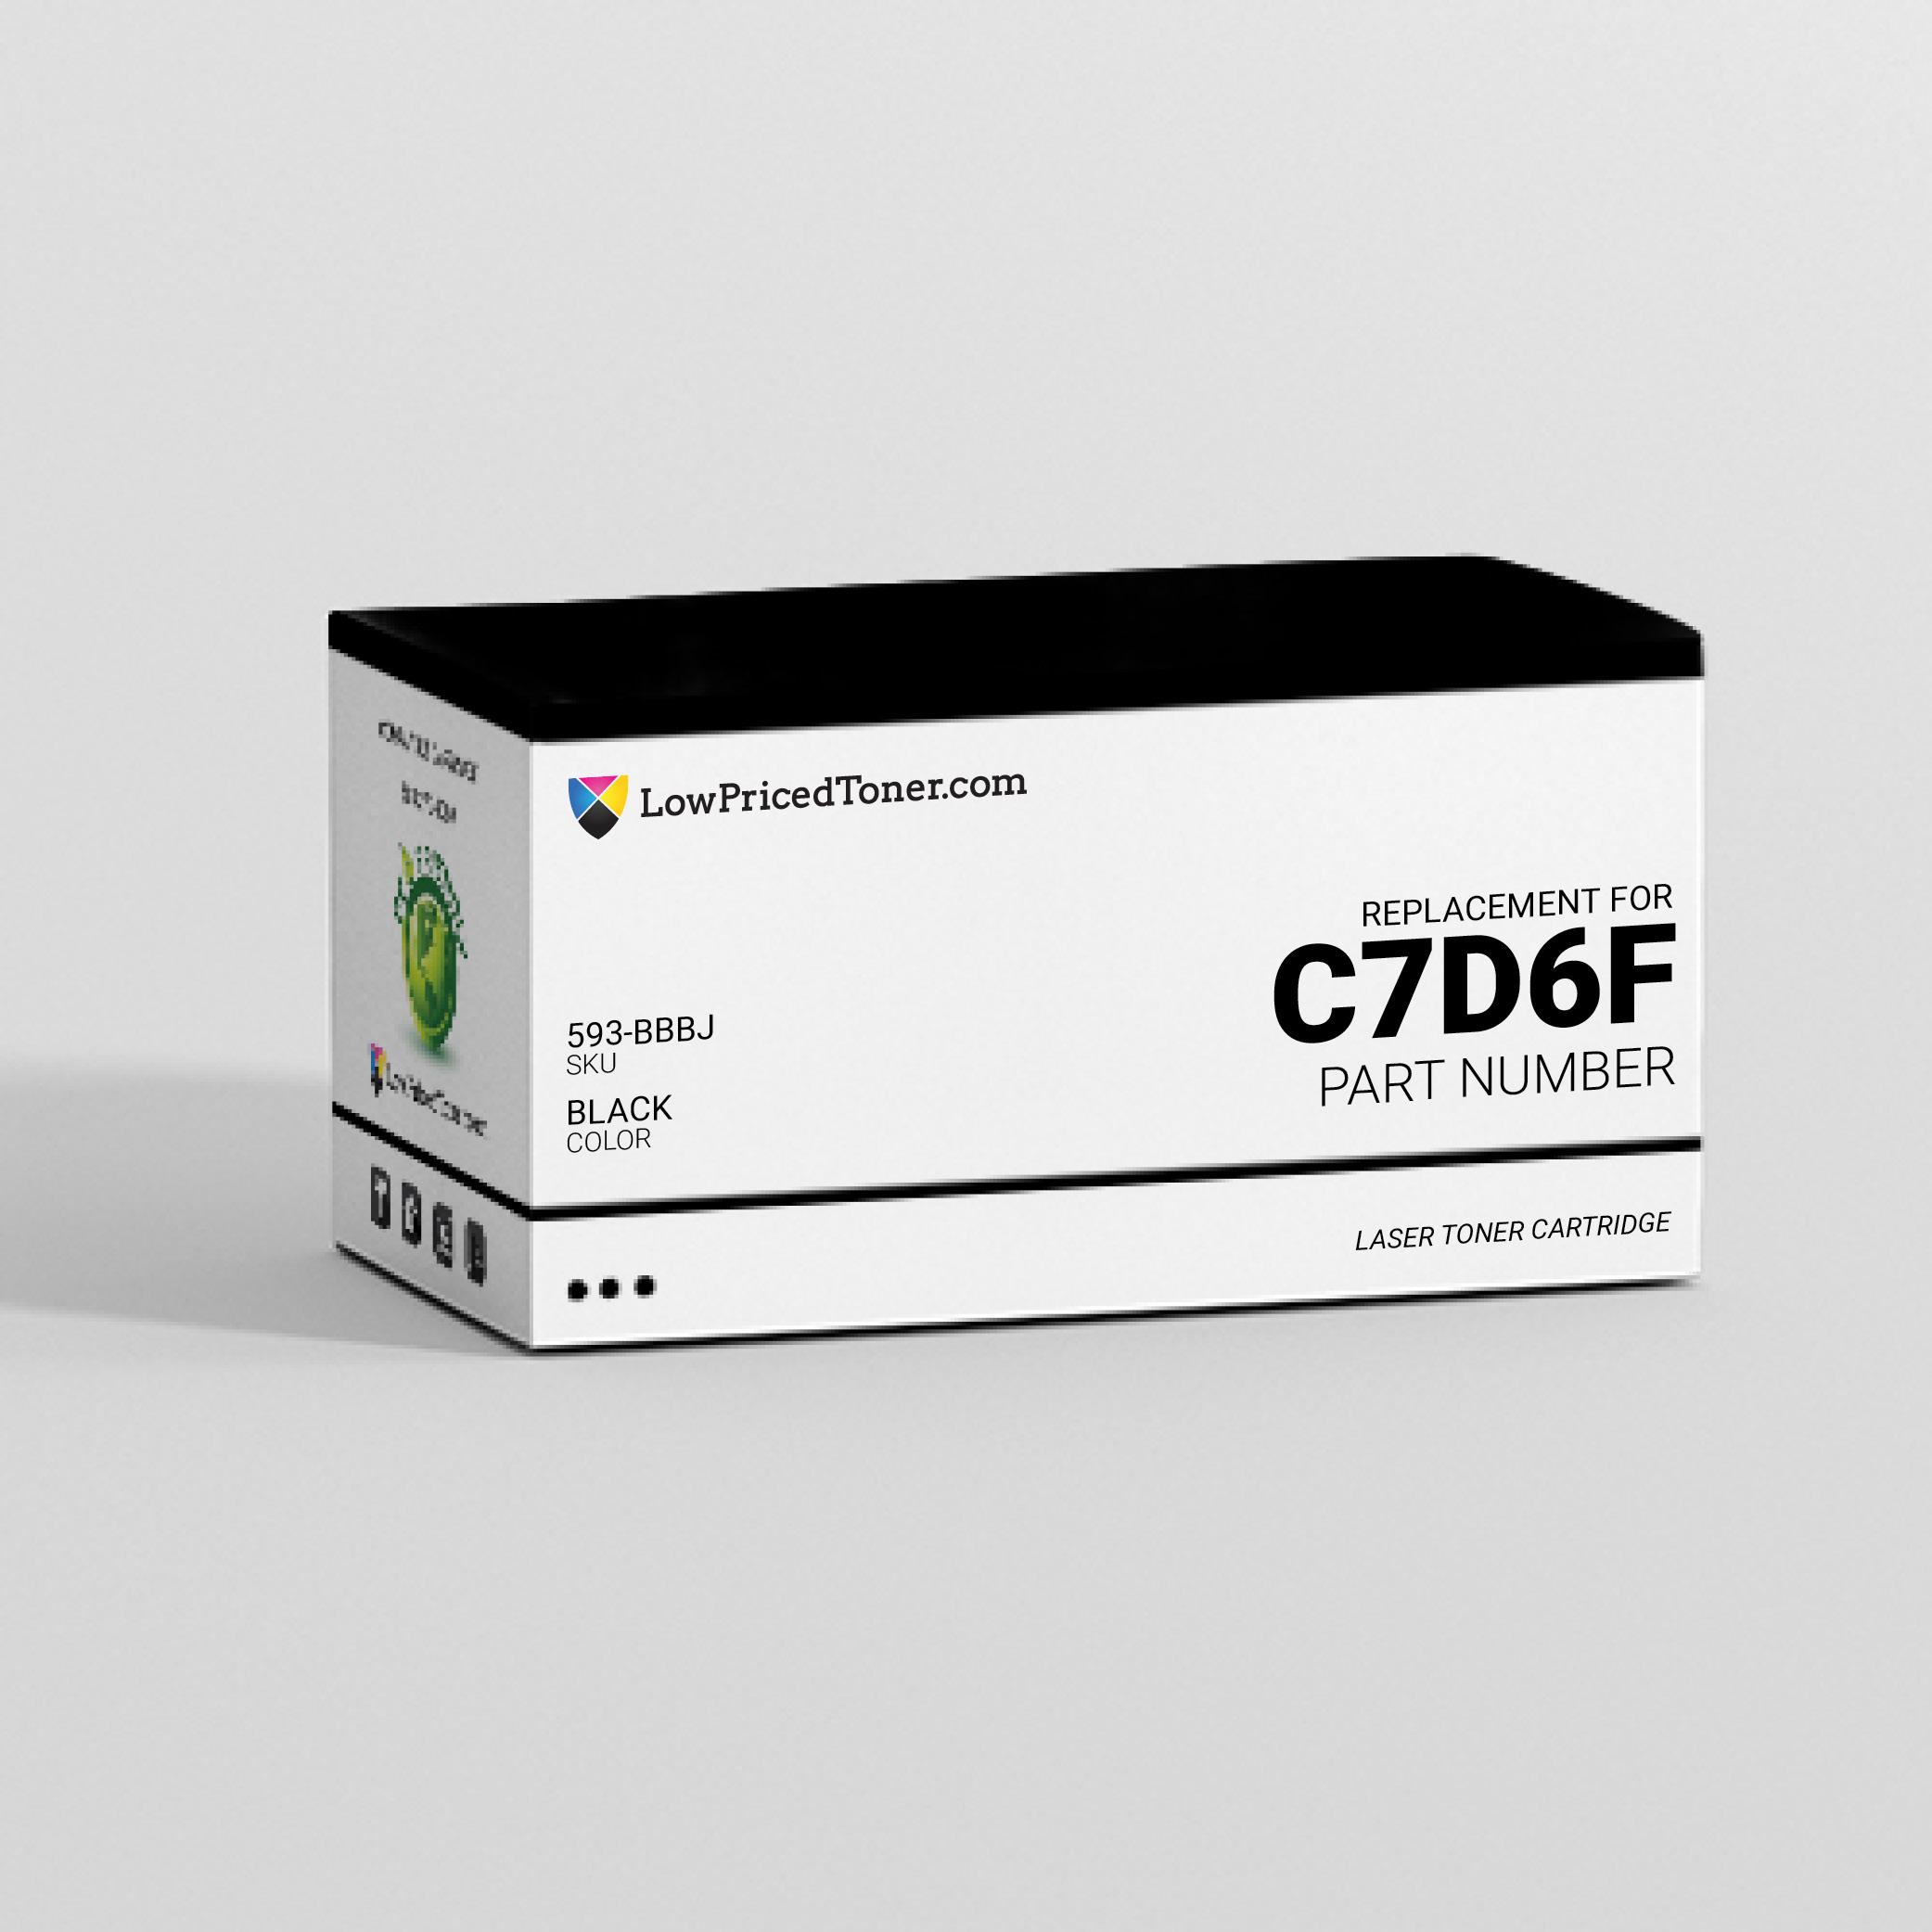 Dell 593-BBBJ C7D6F Compatible Black Laser Toner Cartridge